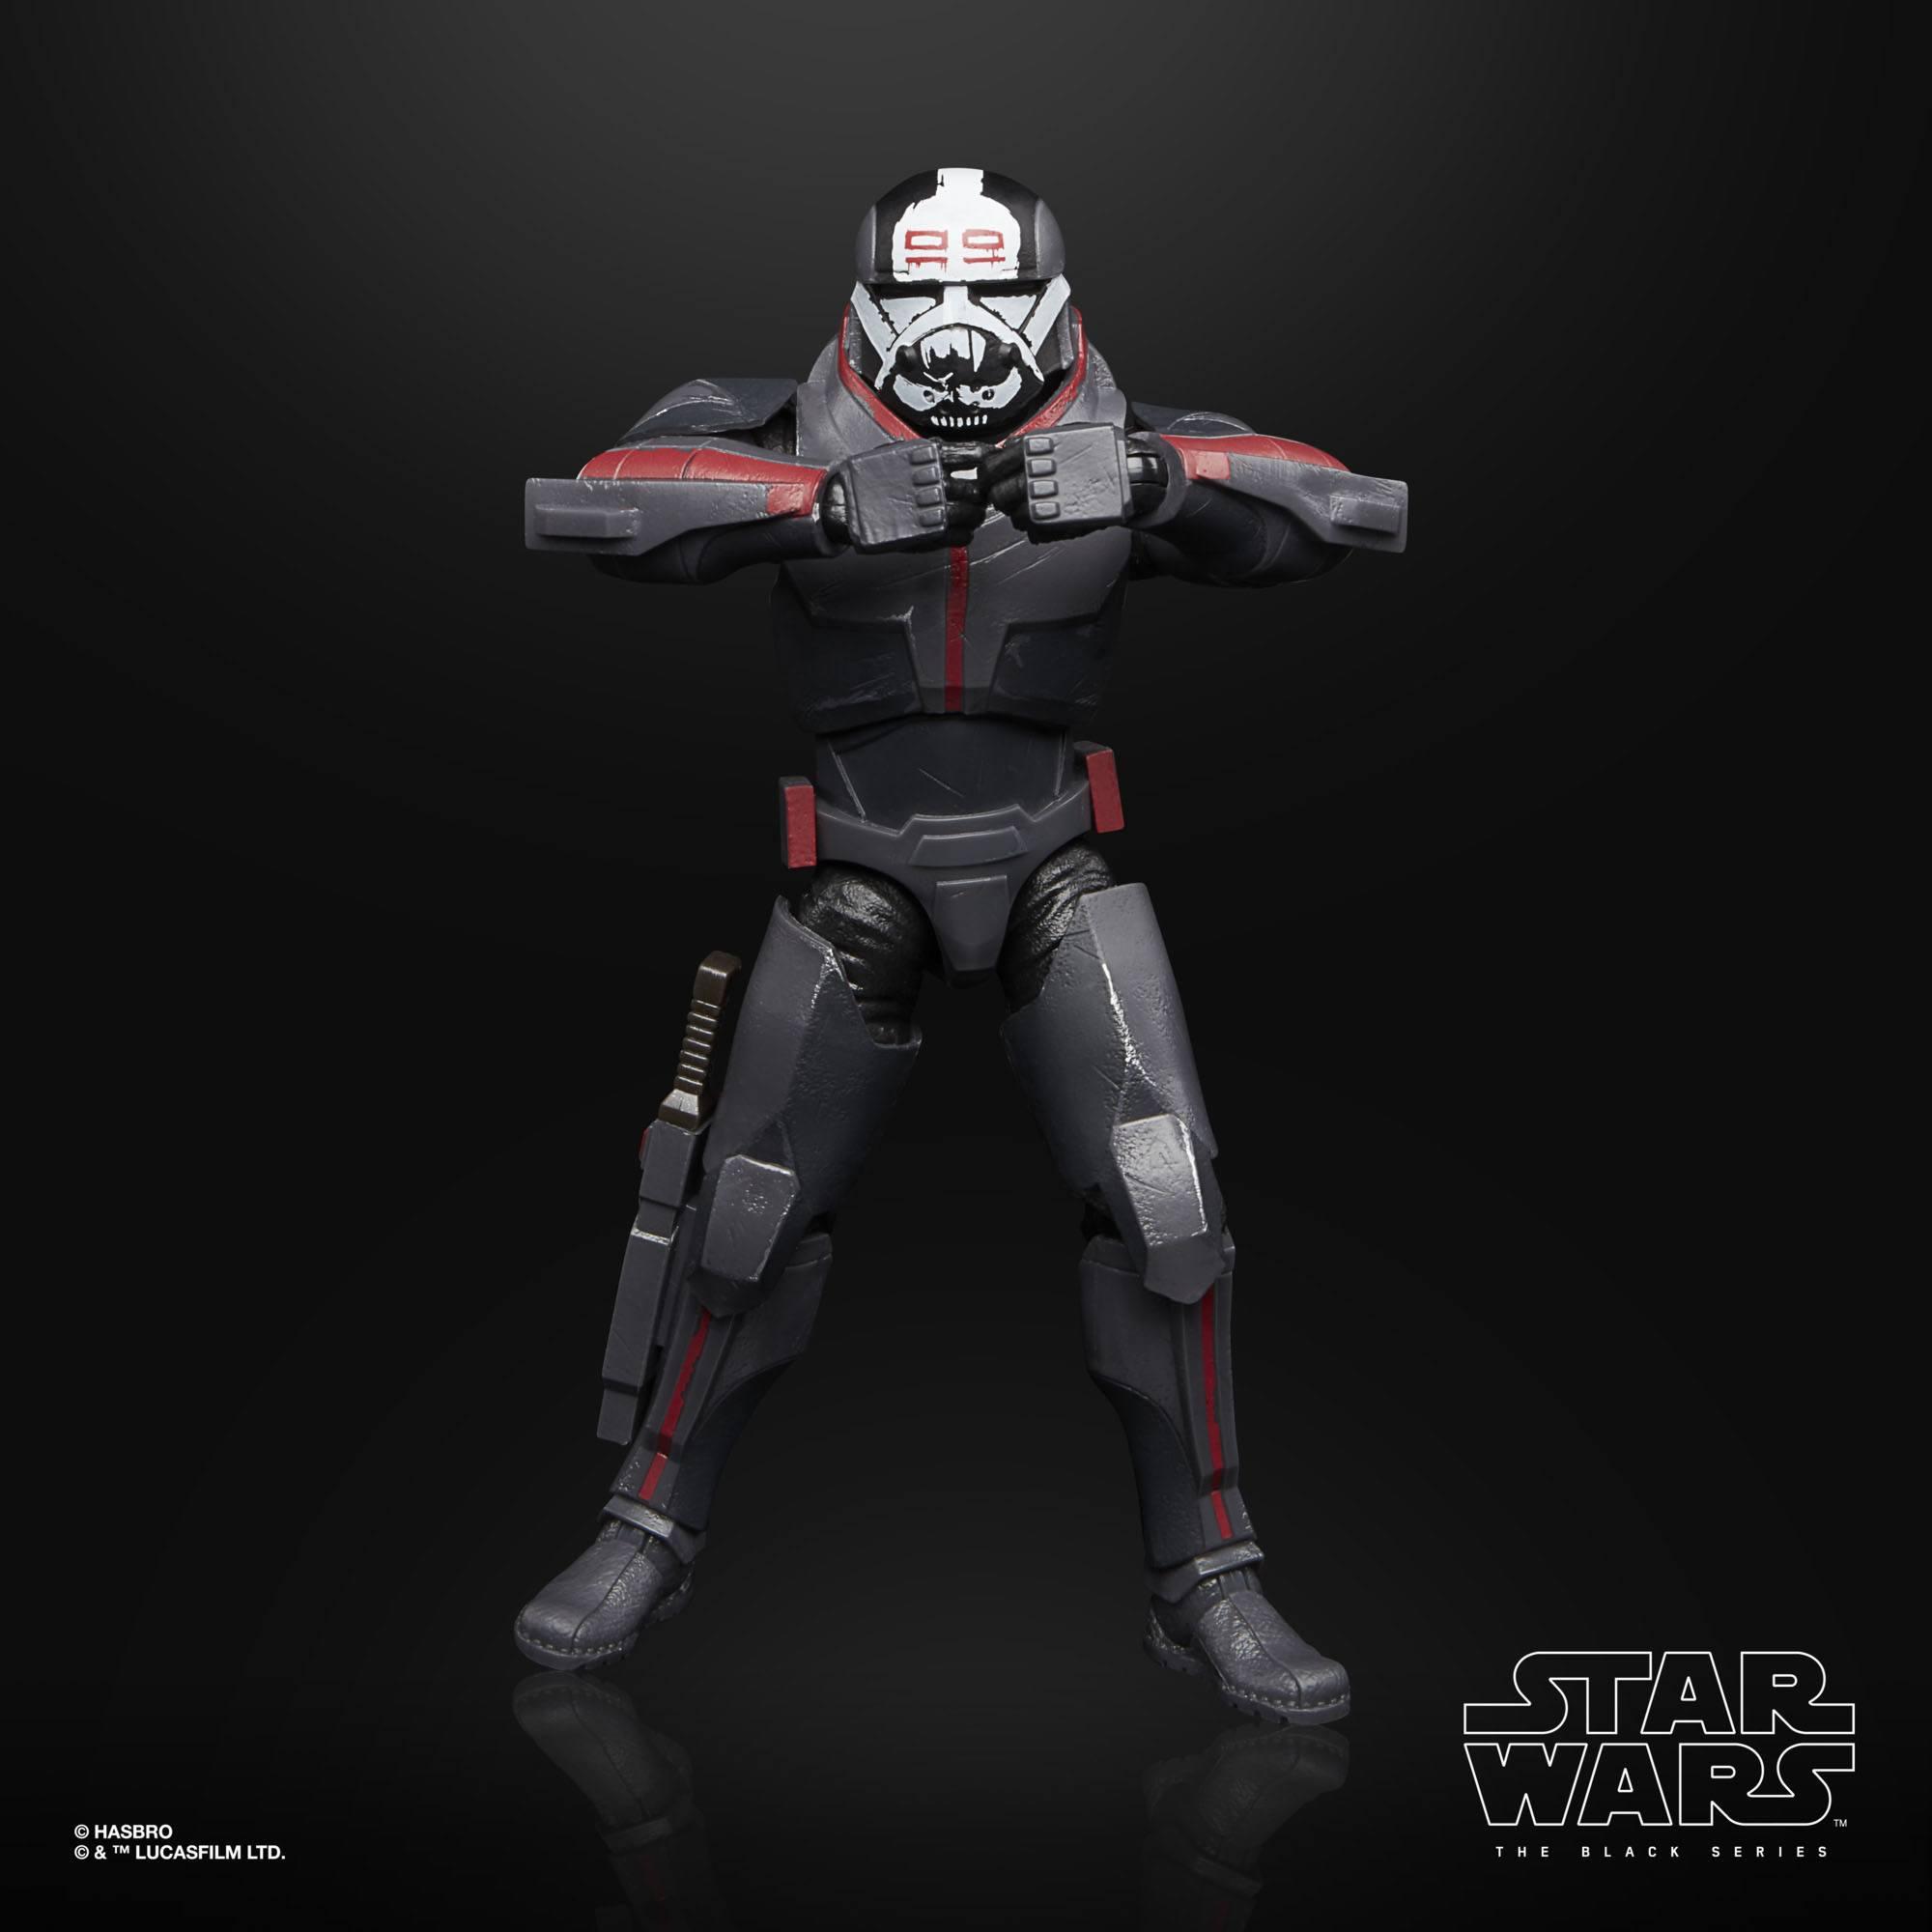 Star Wars The Black Series Bad Batch Wrecker 15cm Actionfigur F06305L00 5010993873739